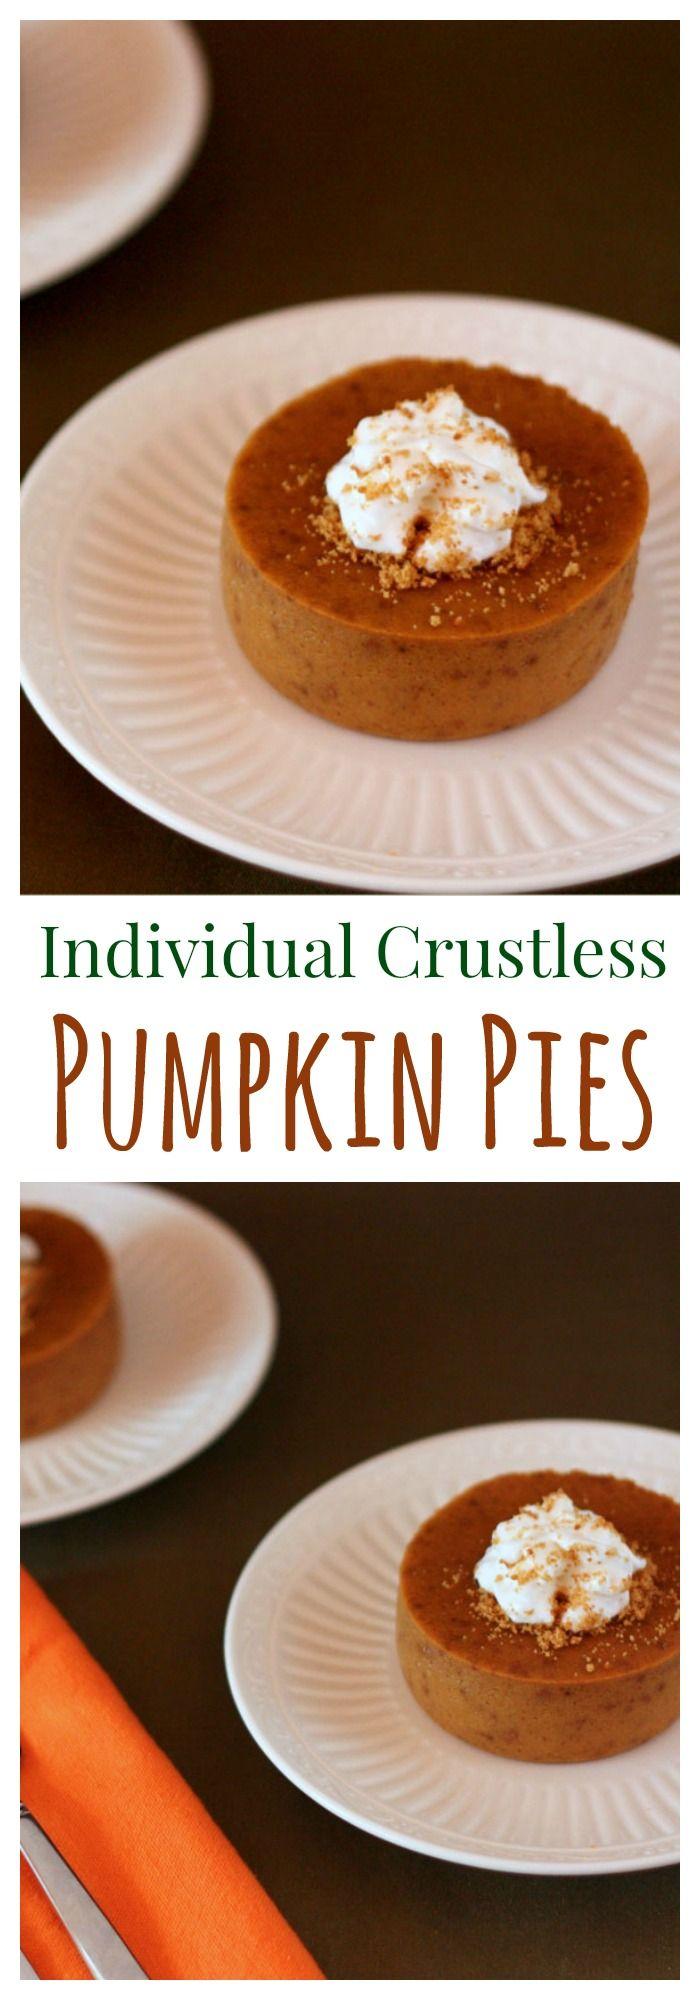 Individual Crustless Pumpkin Pies (or Pumpkin Custards) recipe. Don't wait for Thanksgiving to enjoy the best part of your favorite holiday dessert! (gluten free)